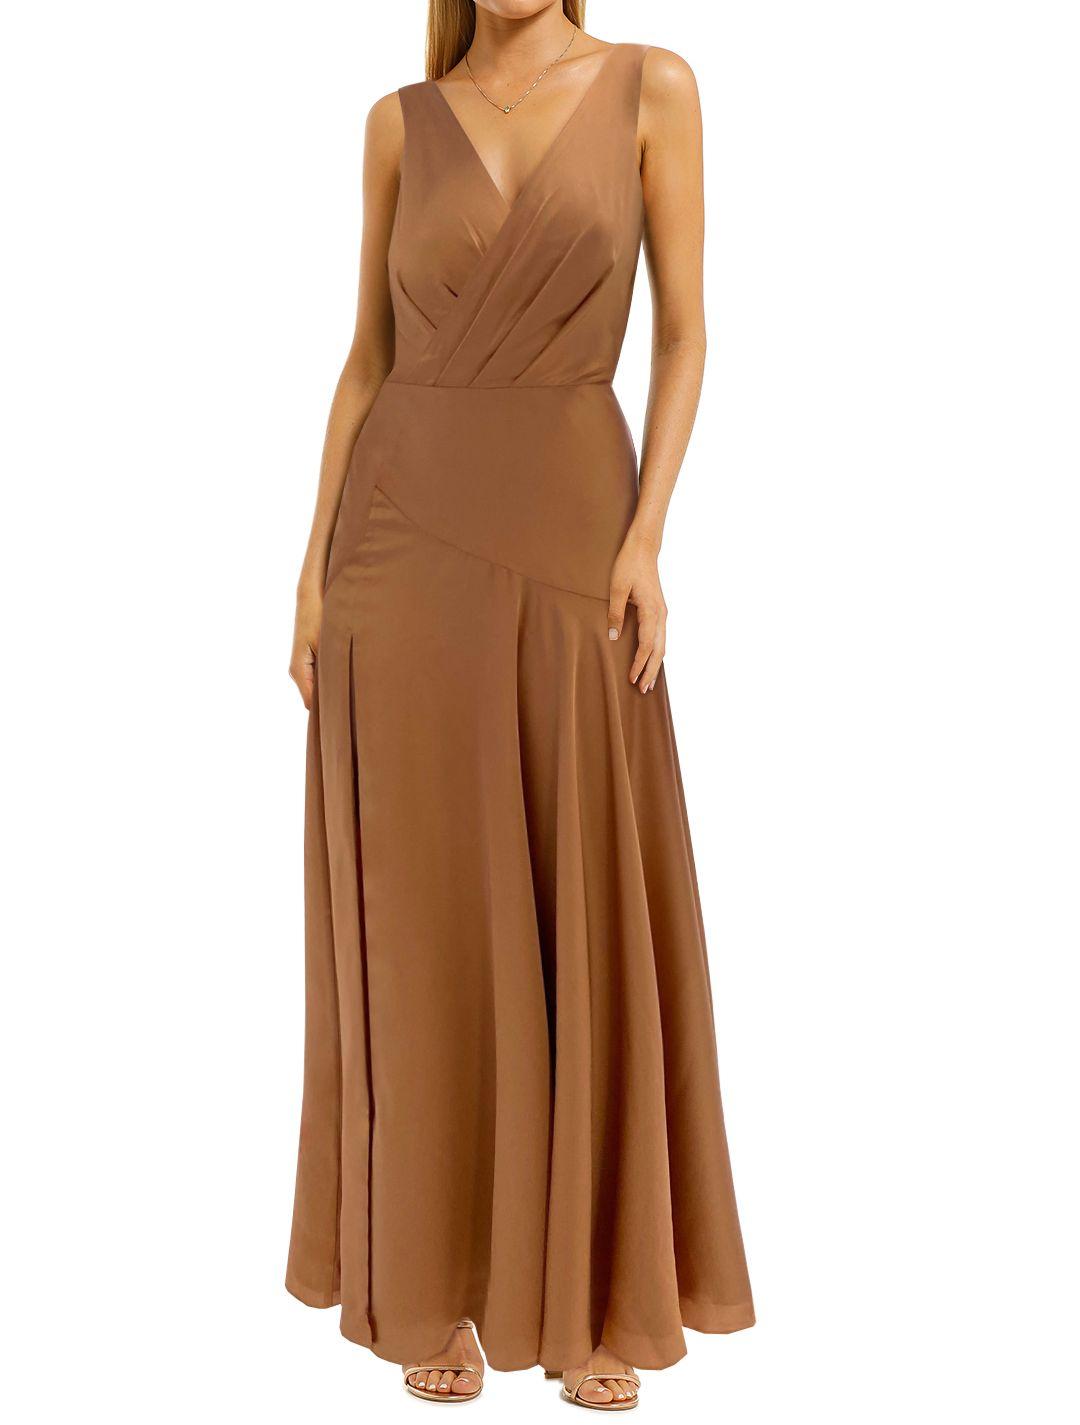 Fame-andPartners-Esclala-Dress-Beige-Maxi-Dress-Front